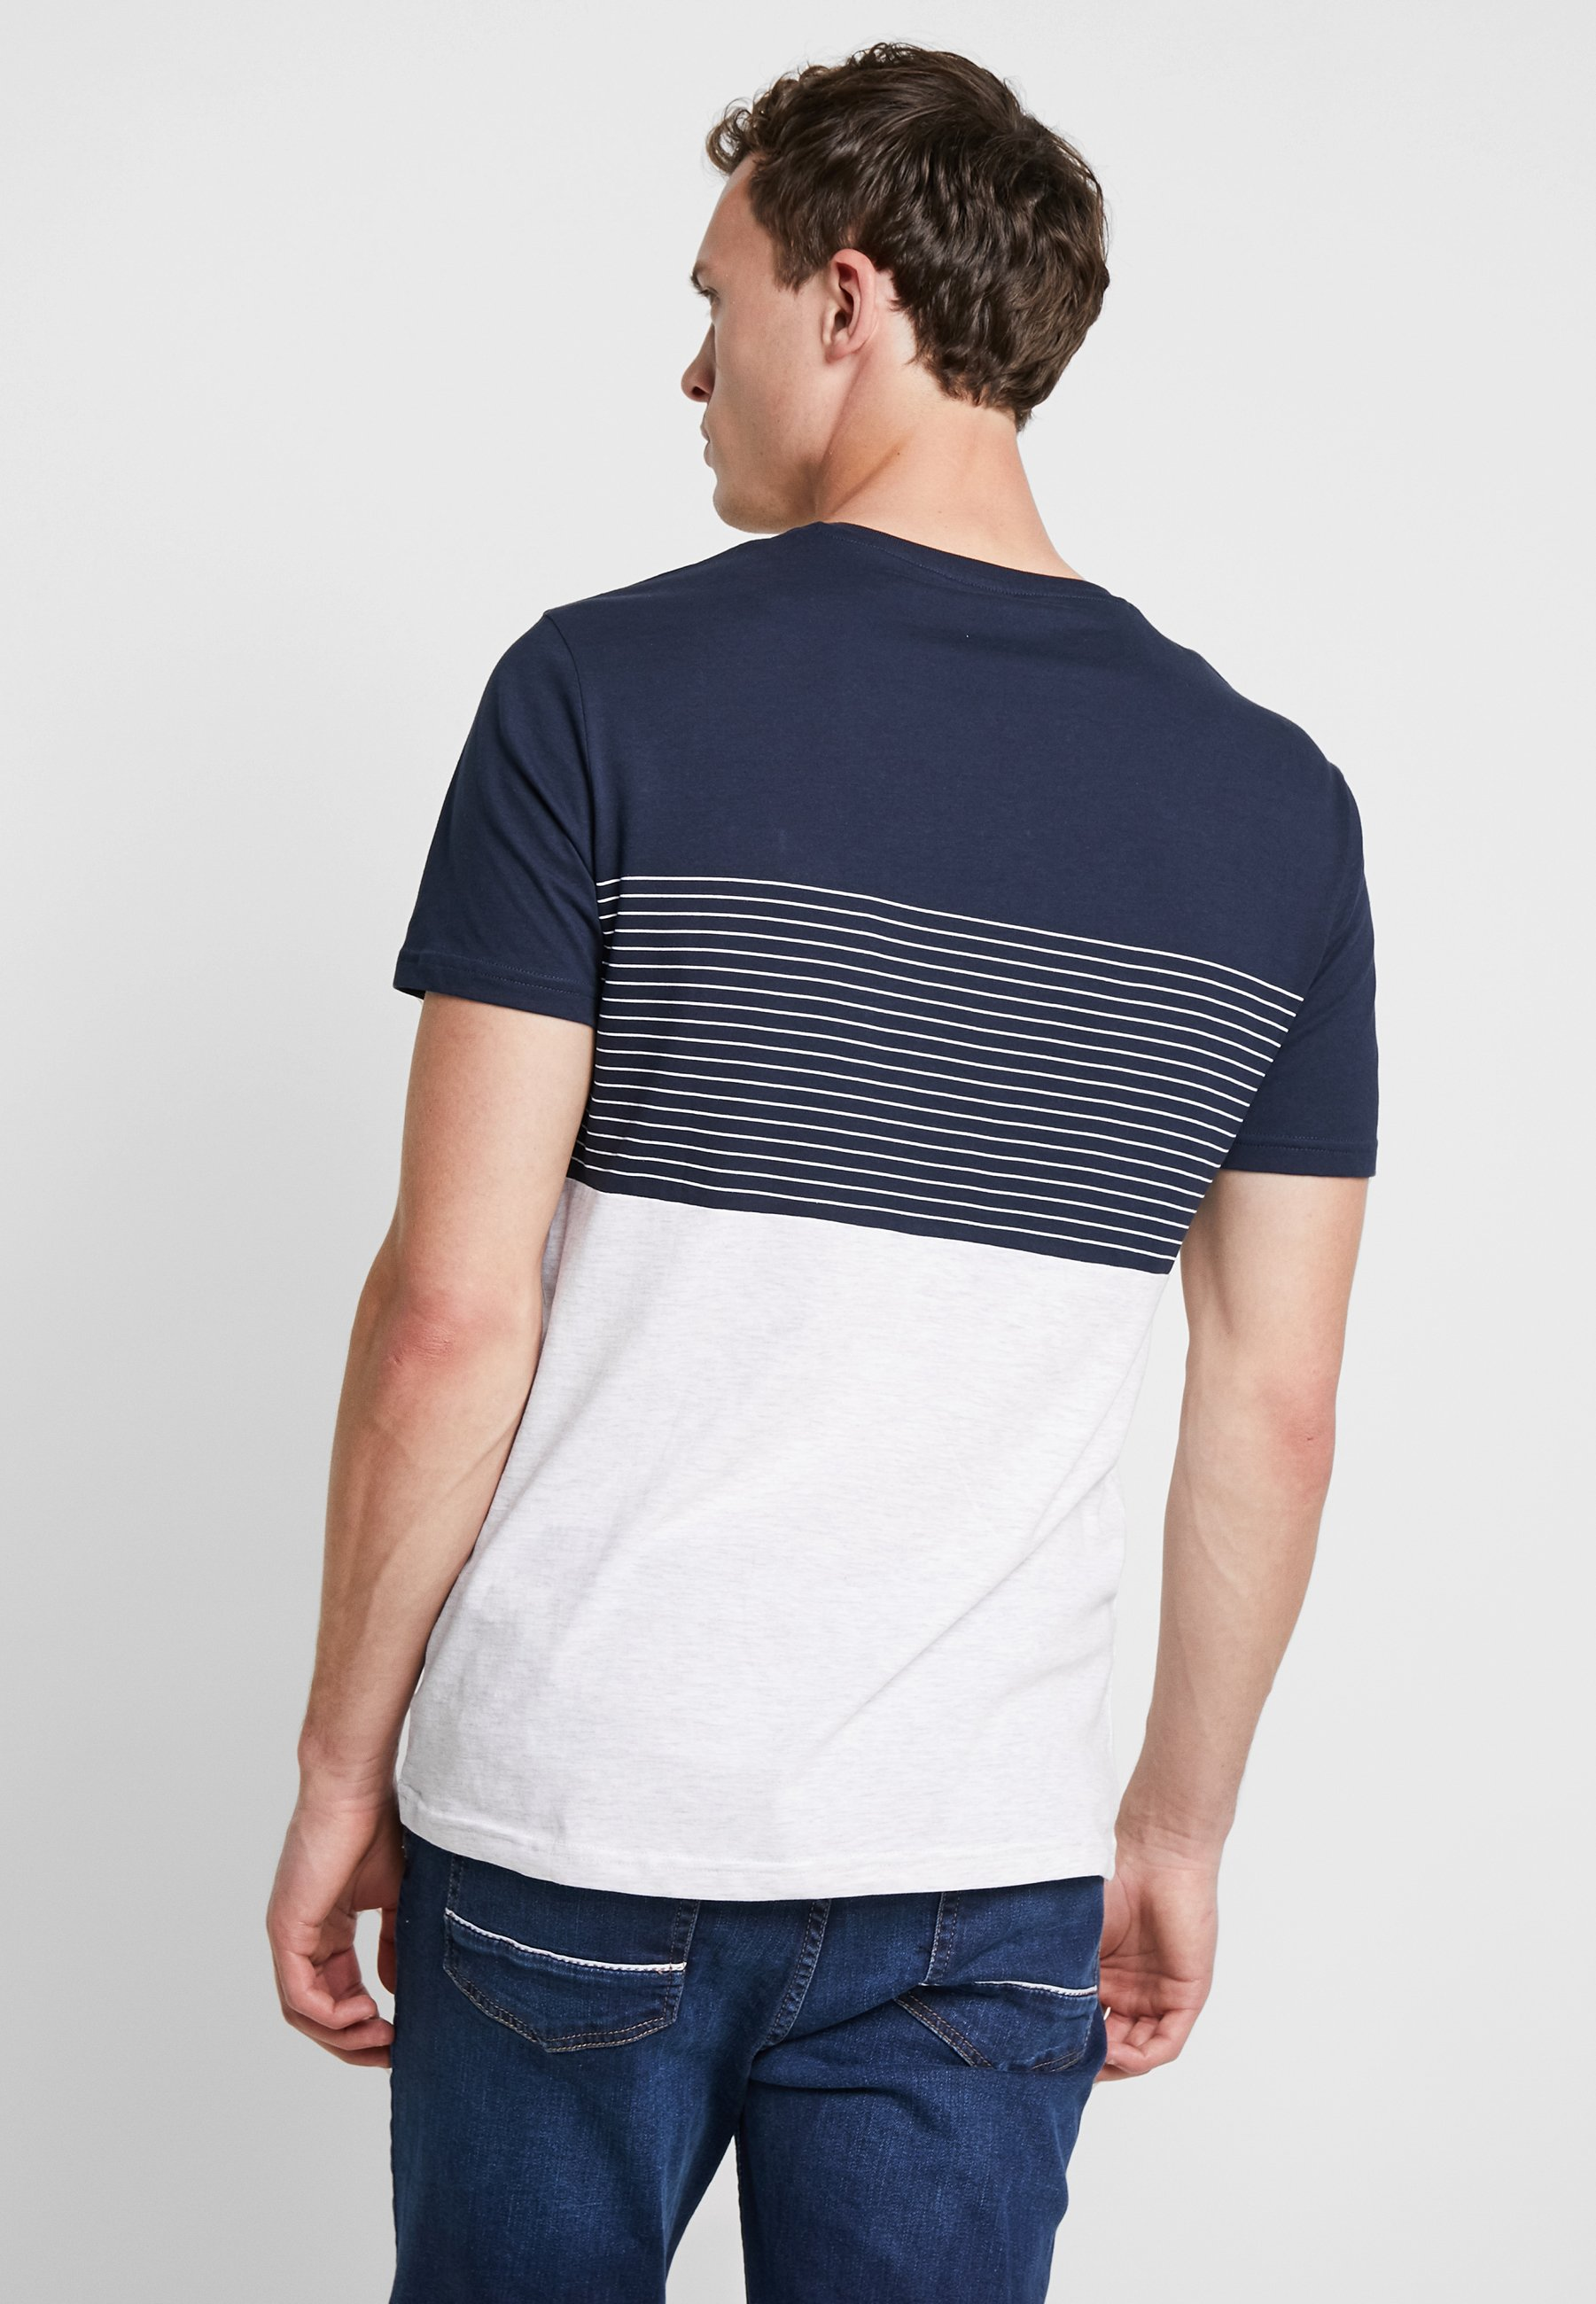 Pier ImpriméDark shirt T One Blue u35TF1lKcJ